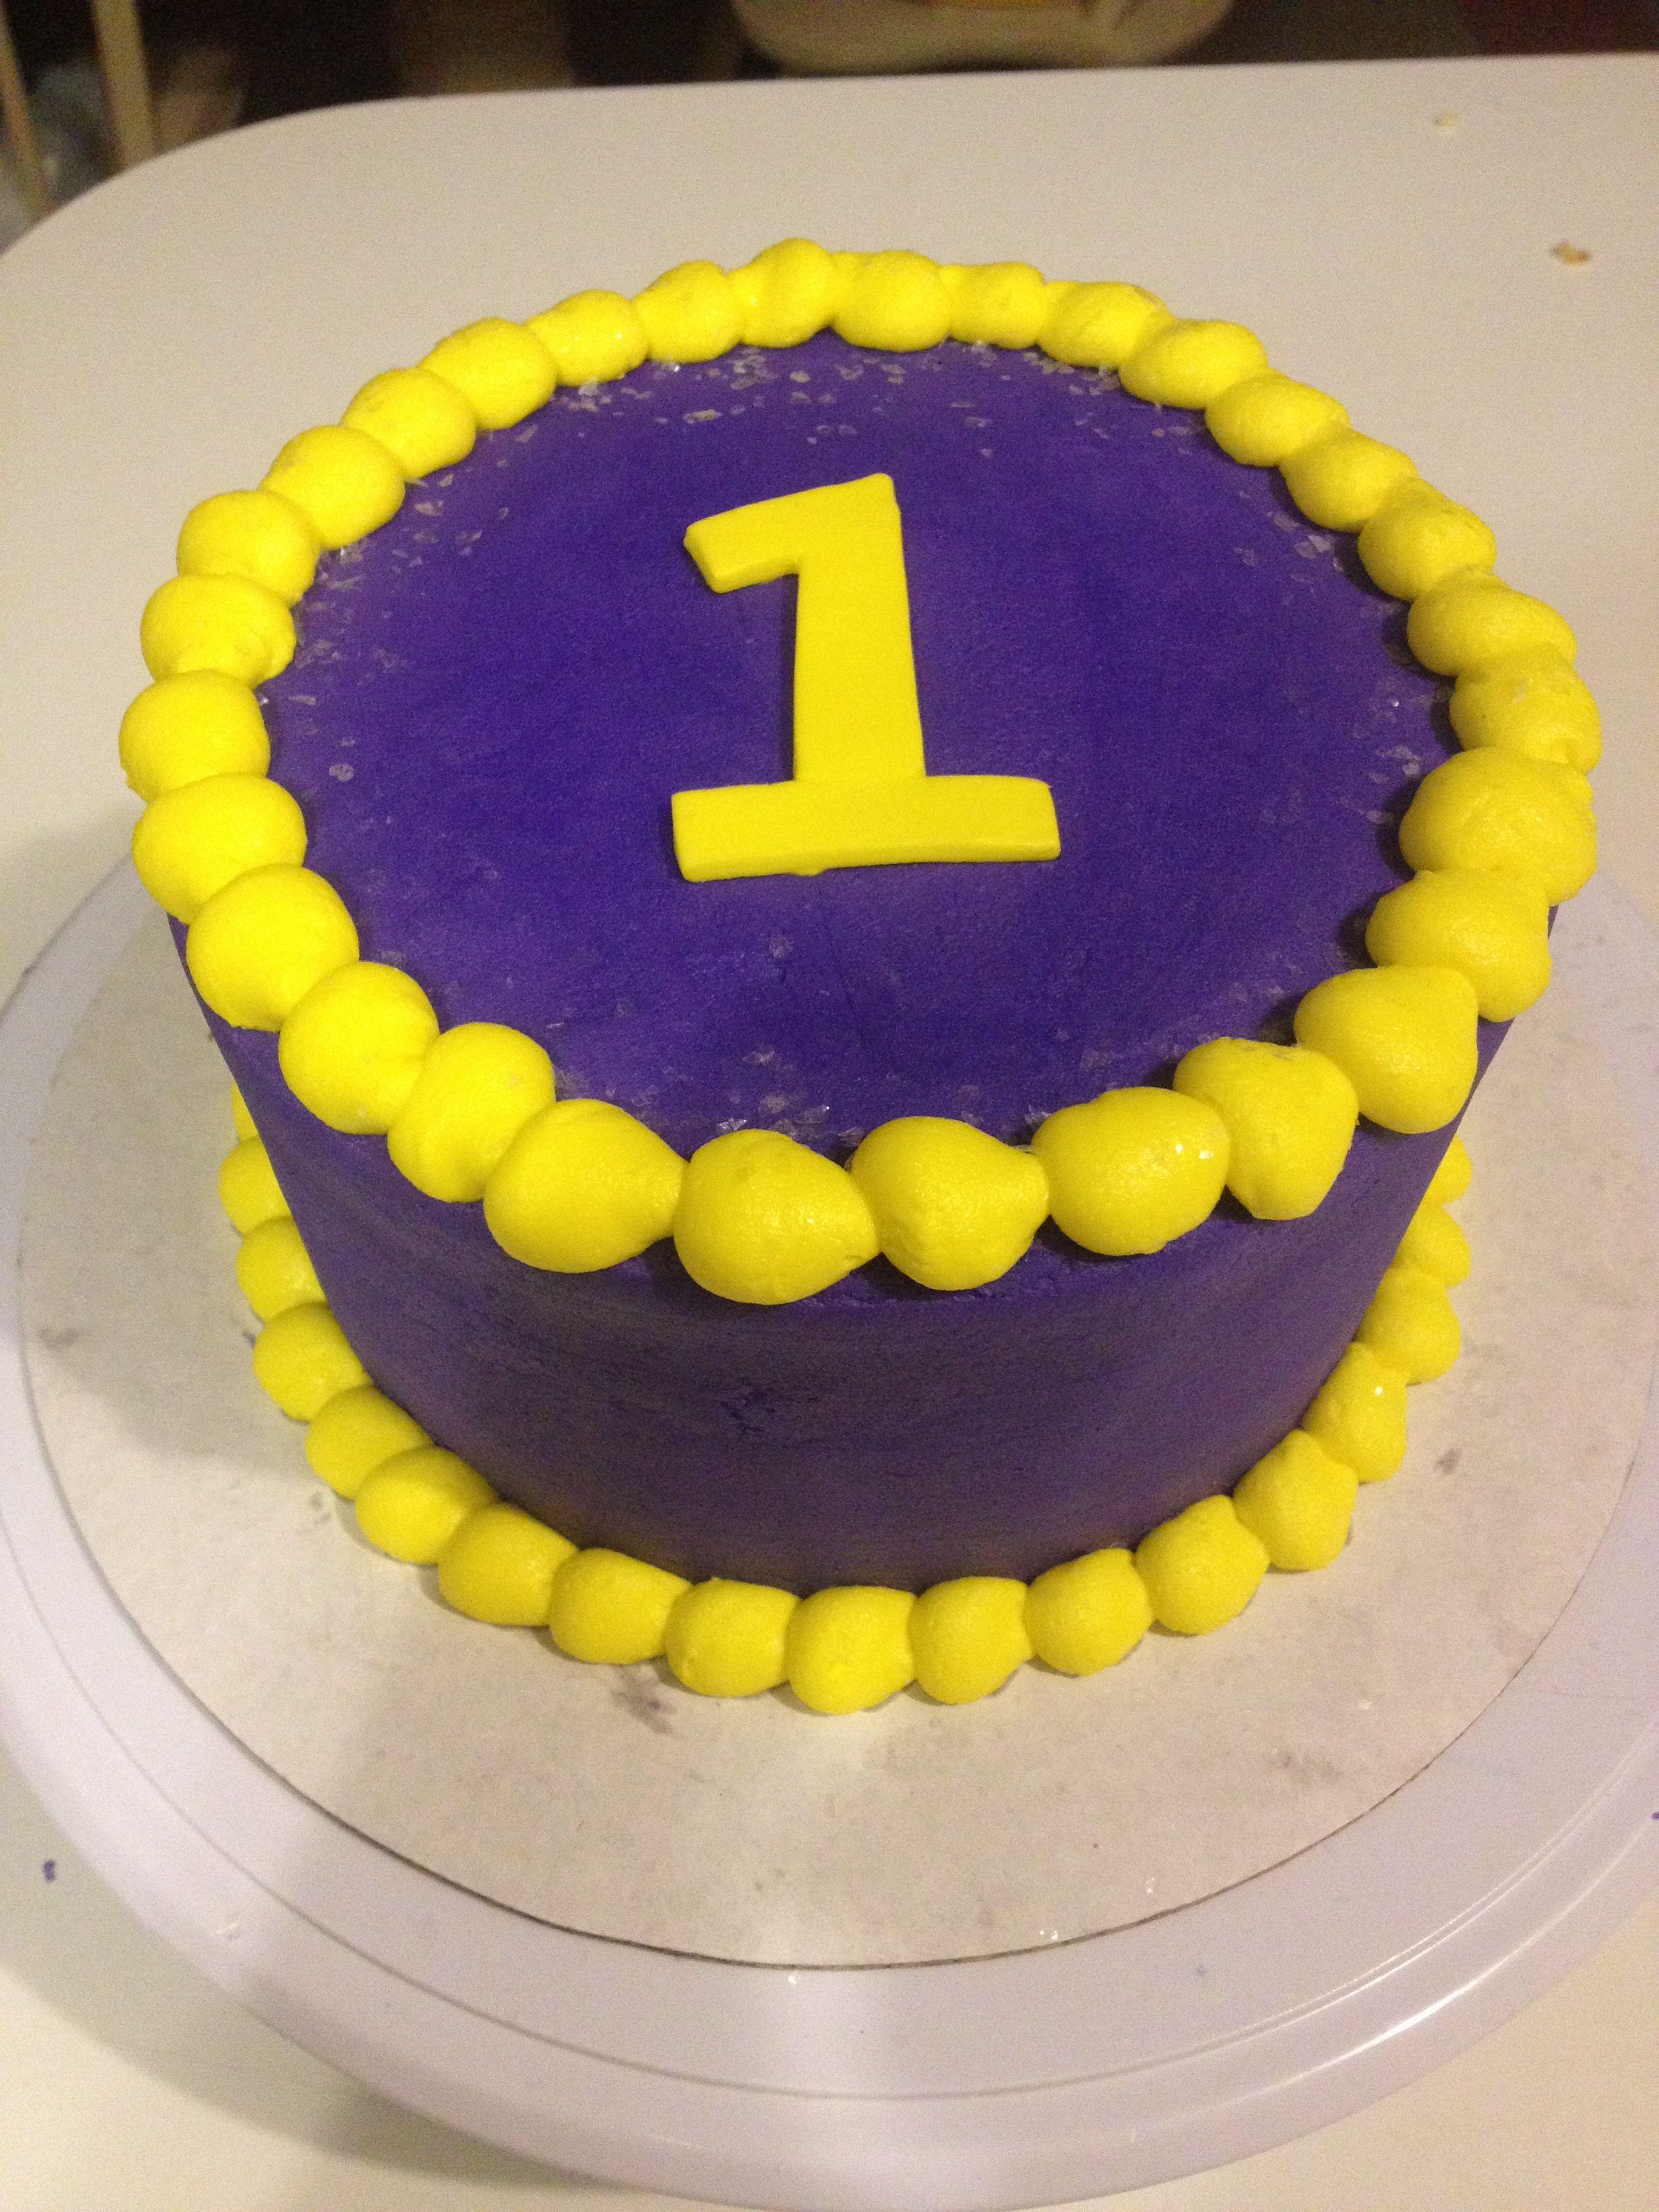 LSU colored smash cake. Made by Christy Zondlo of Christy's Creations OKC.